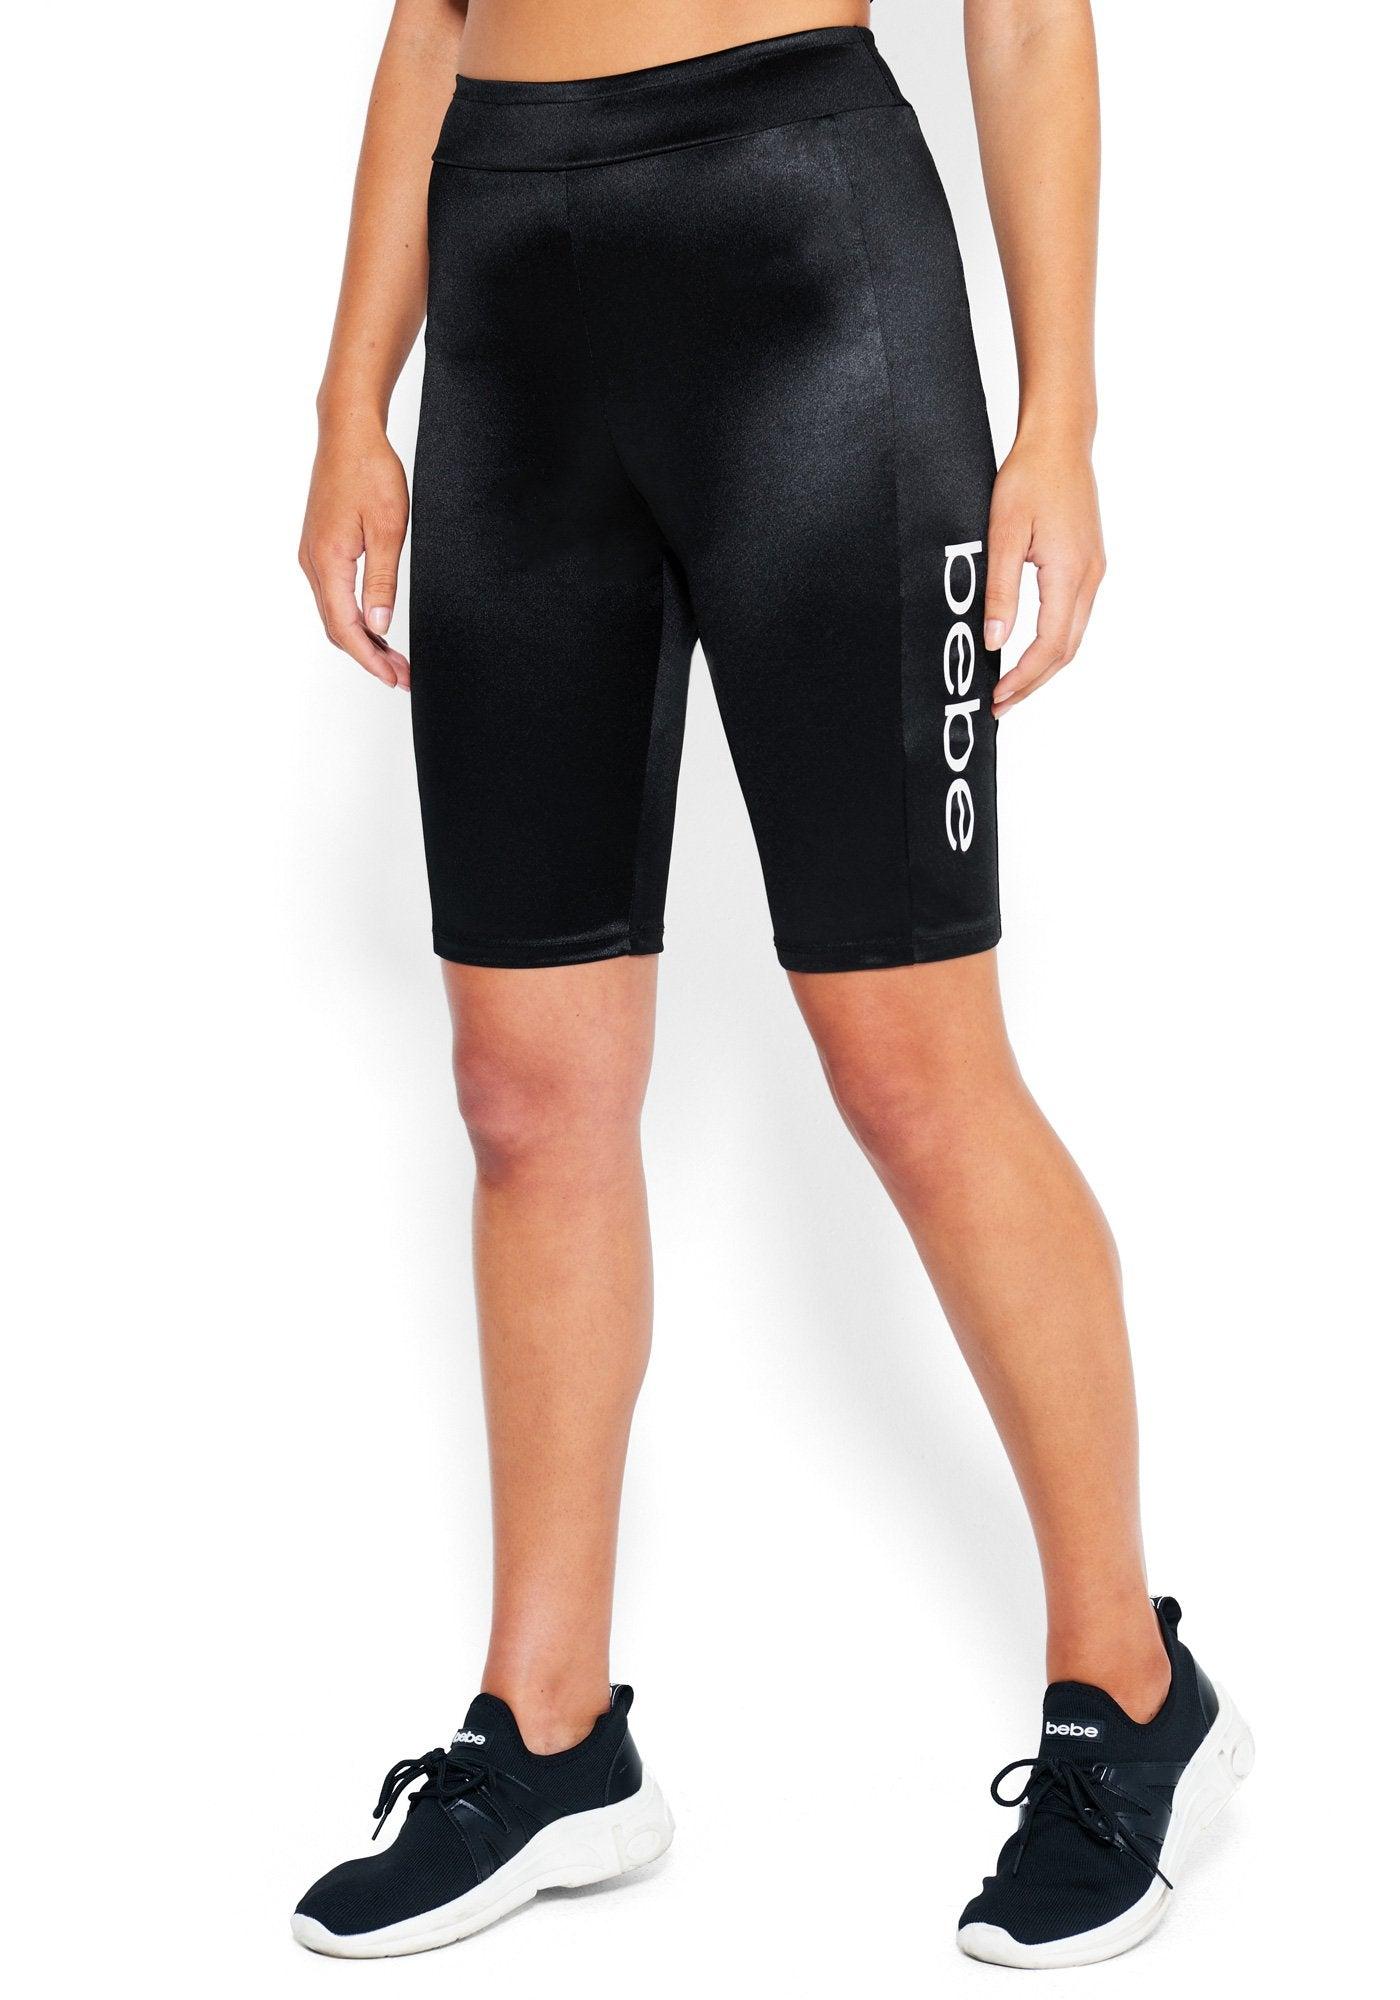 bebe Women's Mya Bebe Logo Bike Shorts, Size XL in Black Spandex